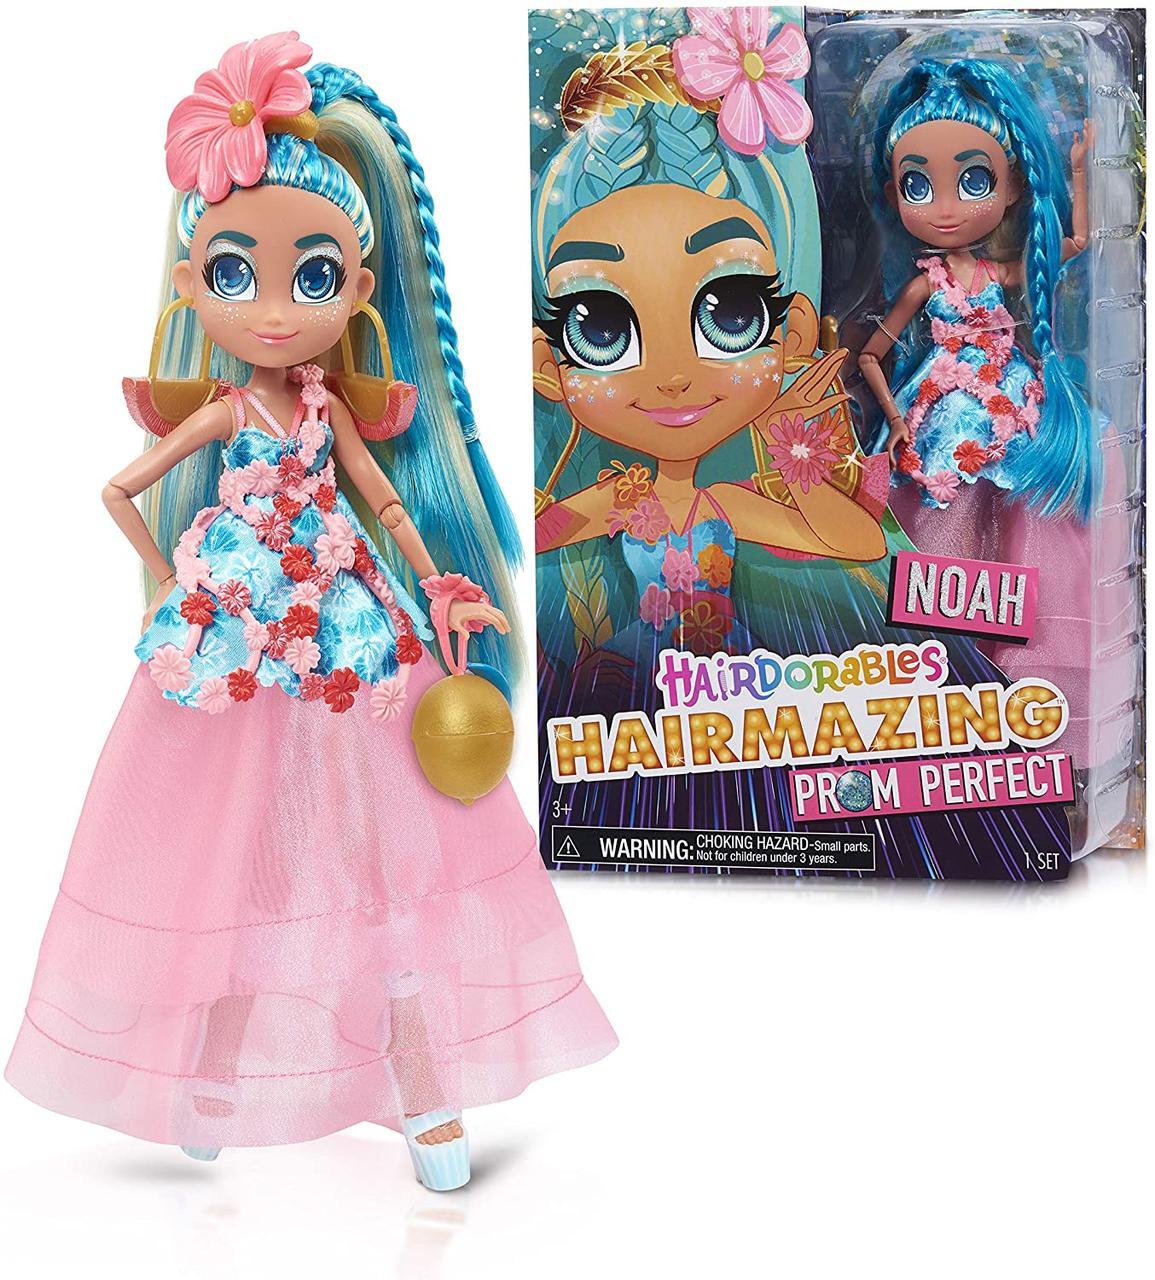 Большая Кукла Хэрдораблс Ноа 26 см Выпускной бал Hairdorables Hairmazing Noah Fashion Doll